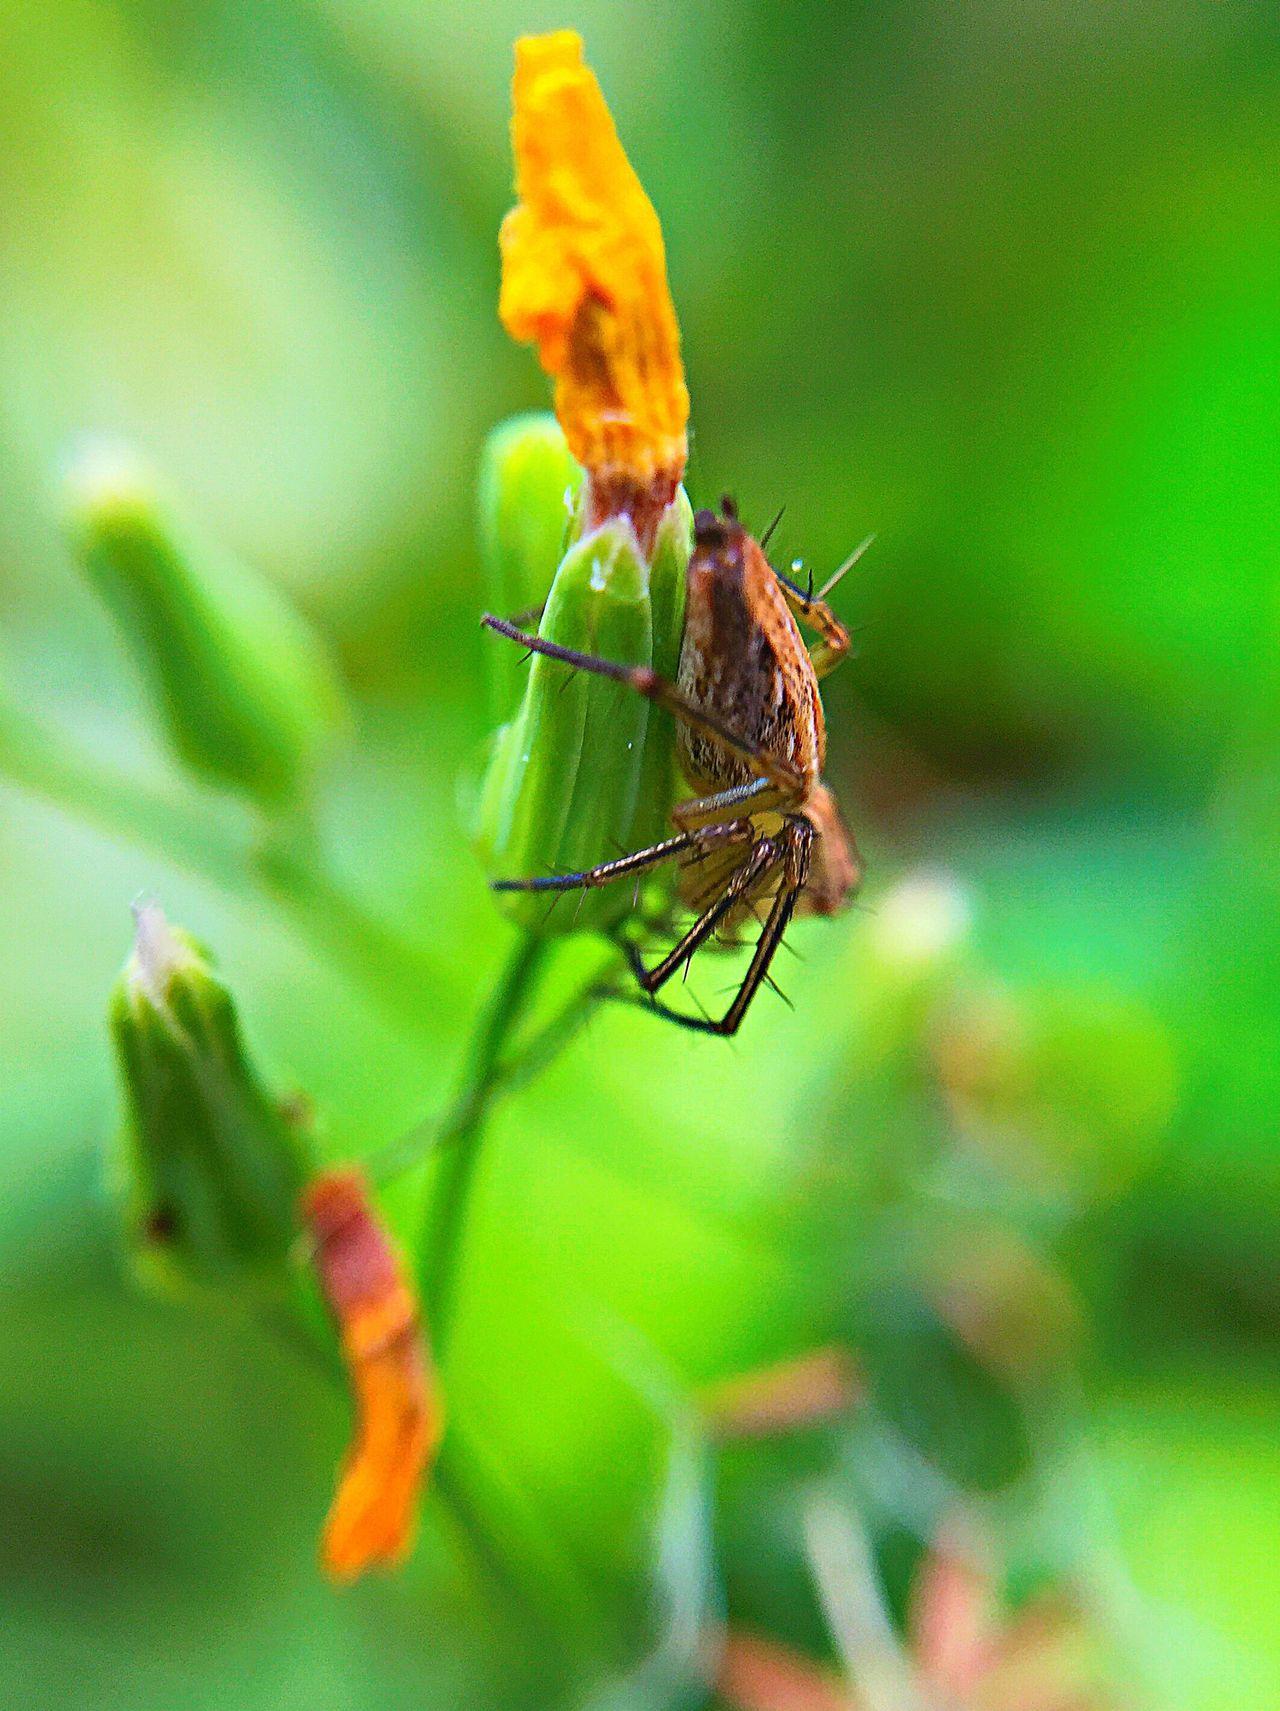 Small spider